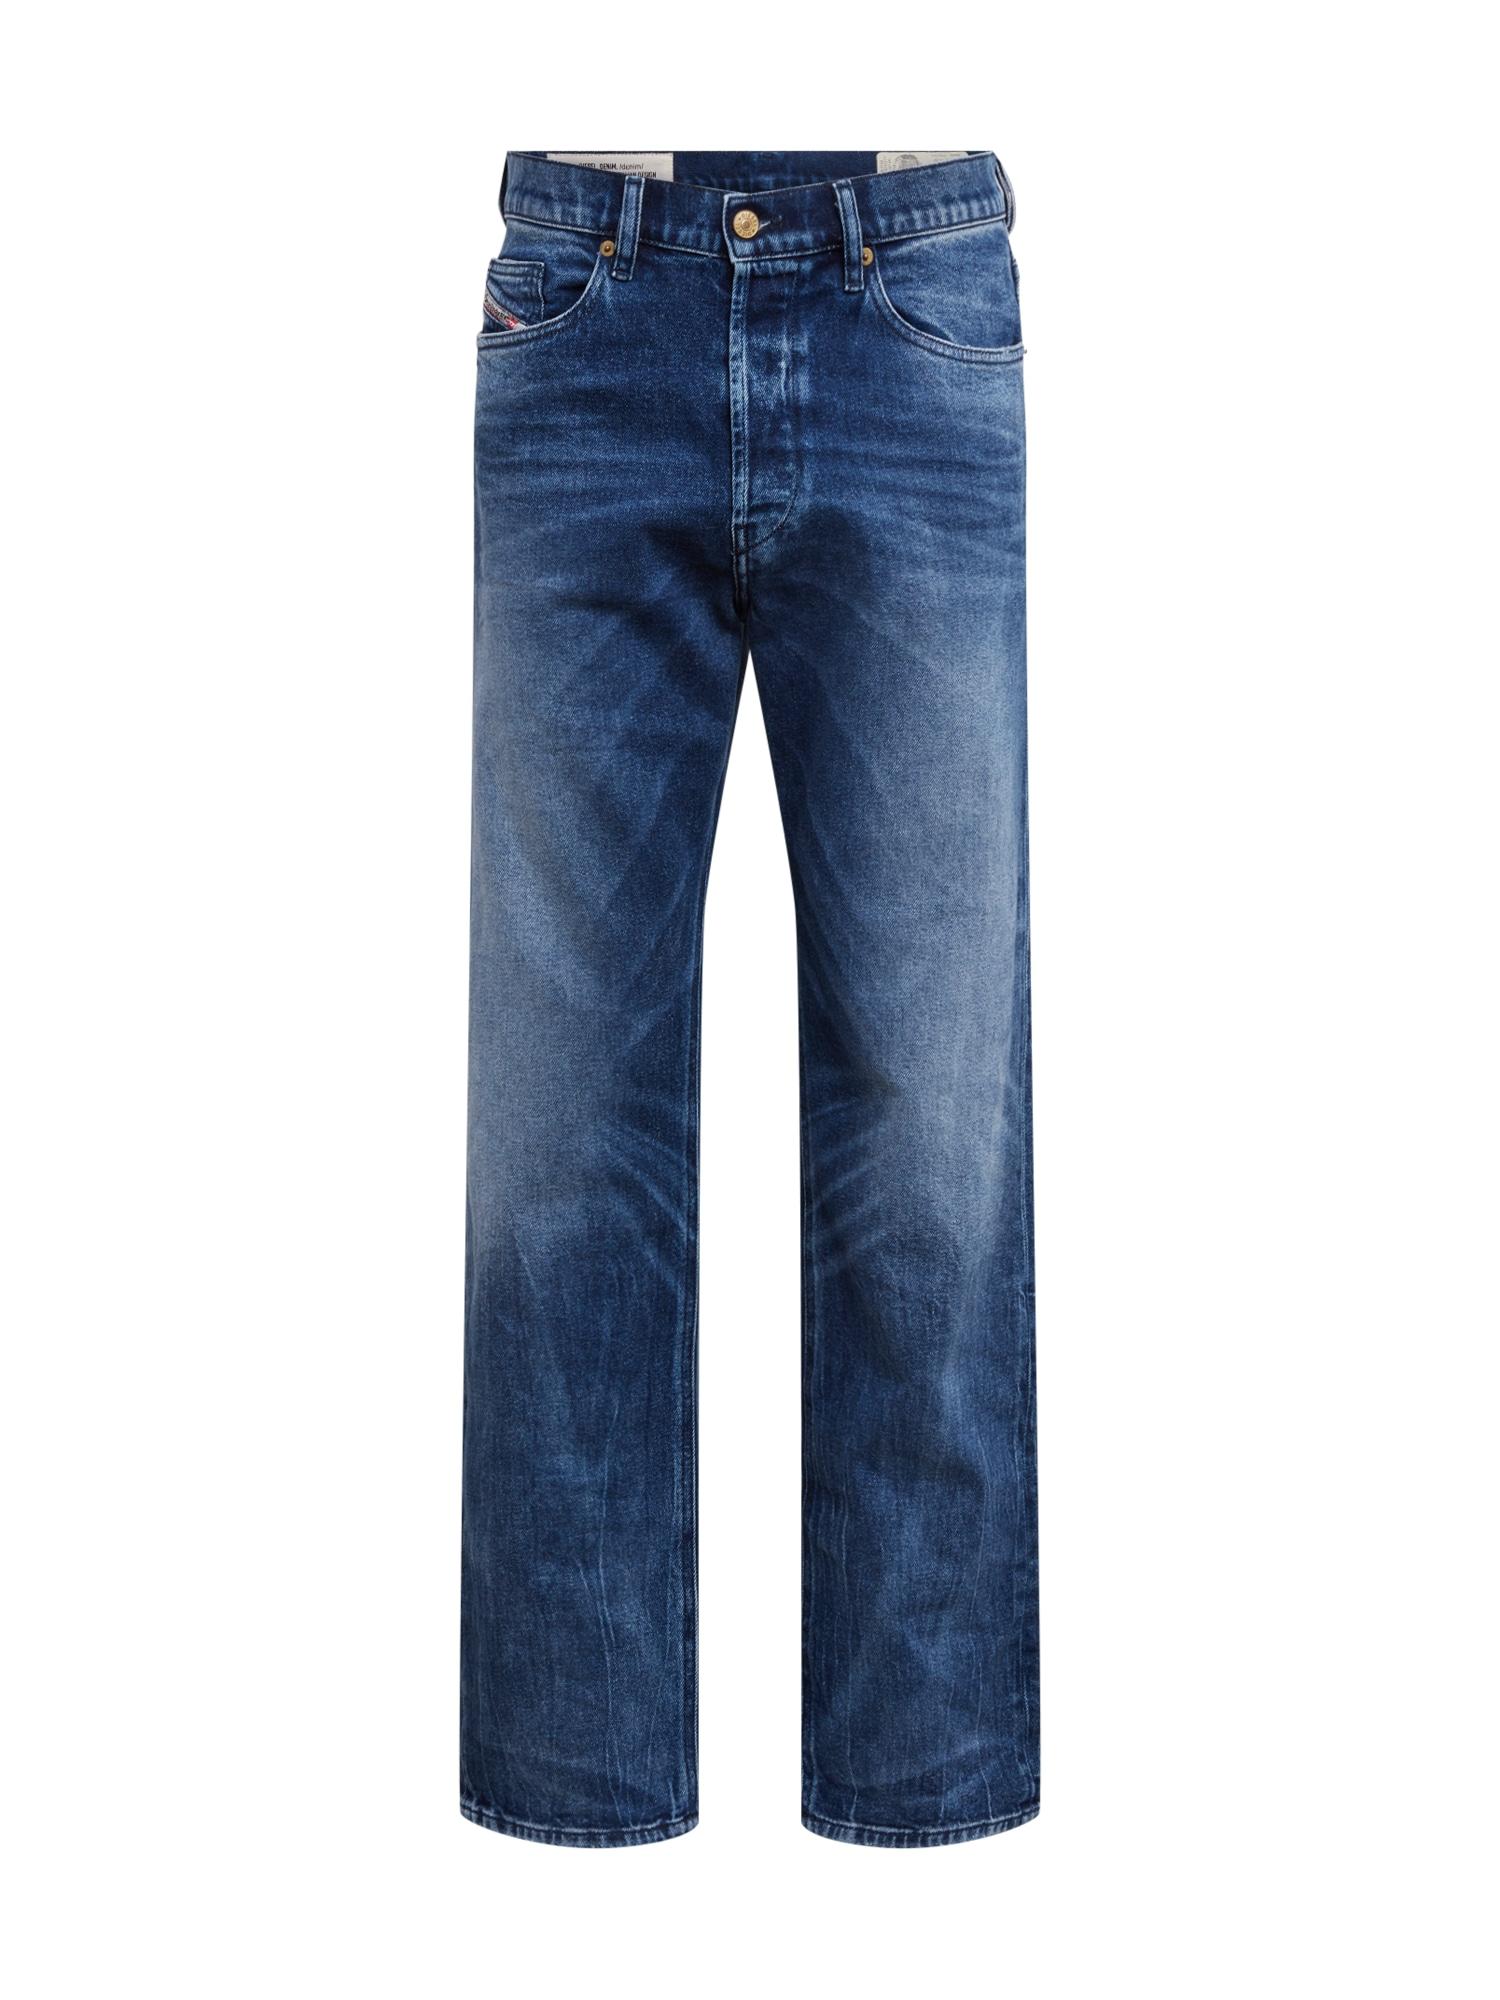 DIESEL Džinsai 'D-MACS' tamsiai (džinso) mėlyna